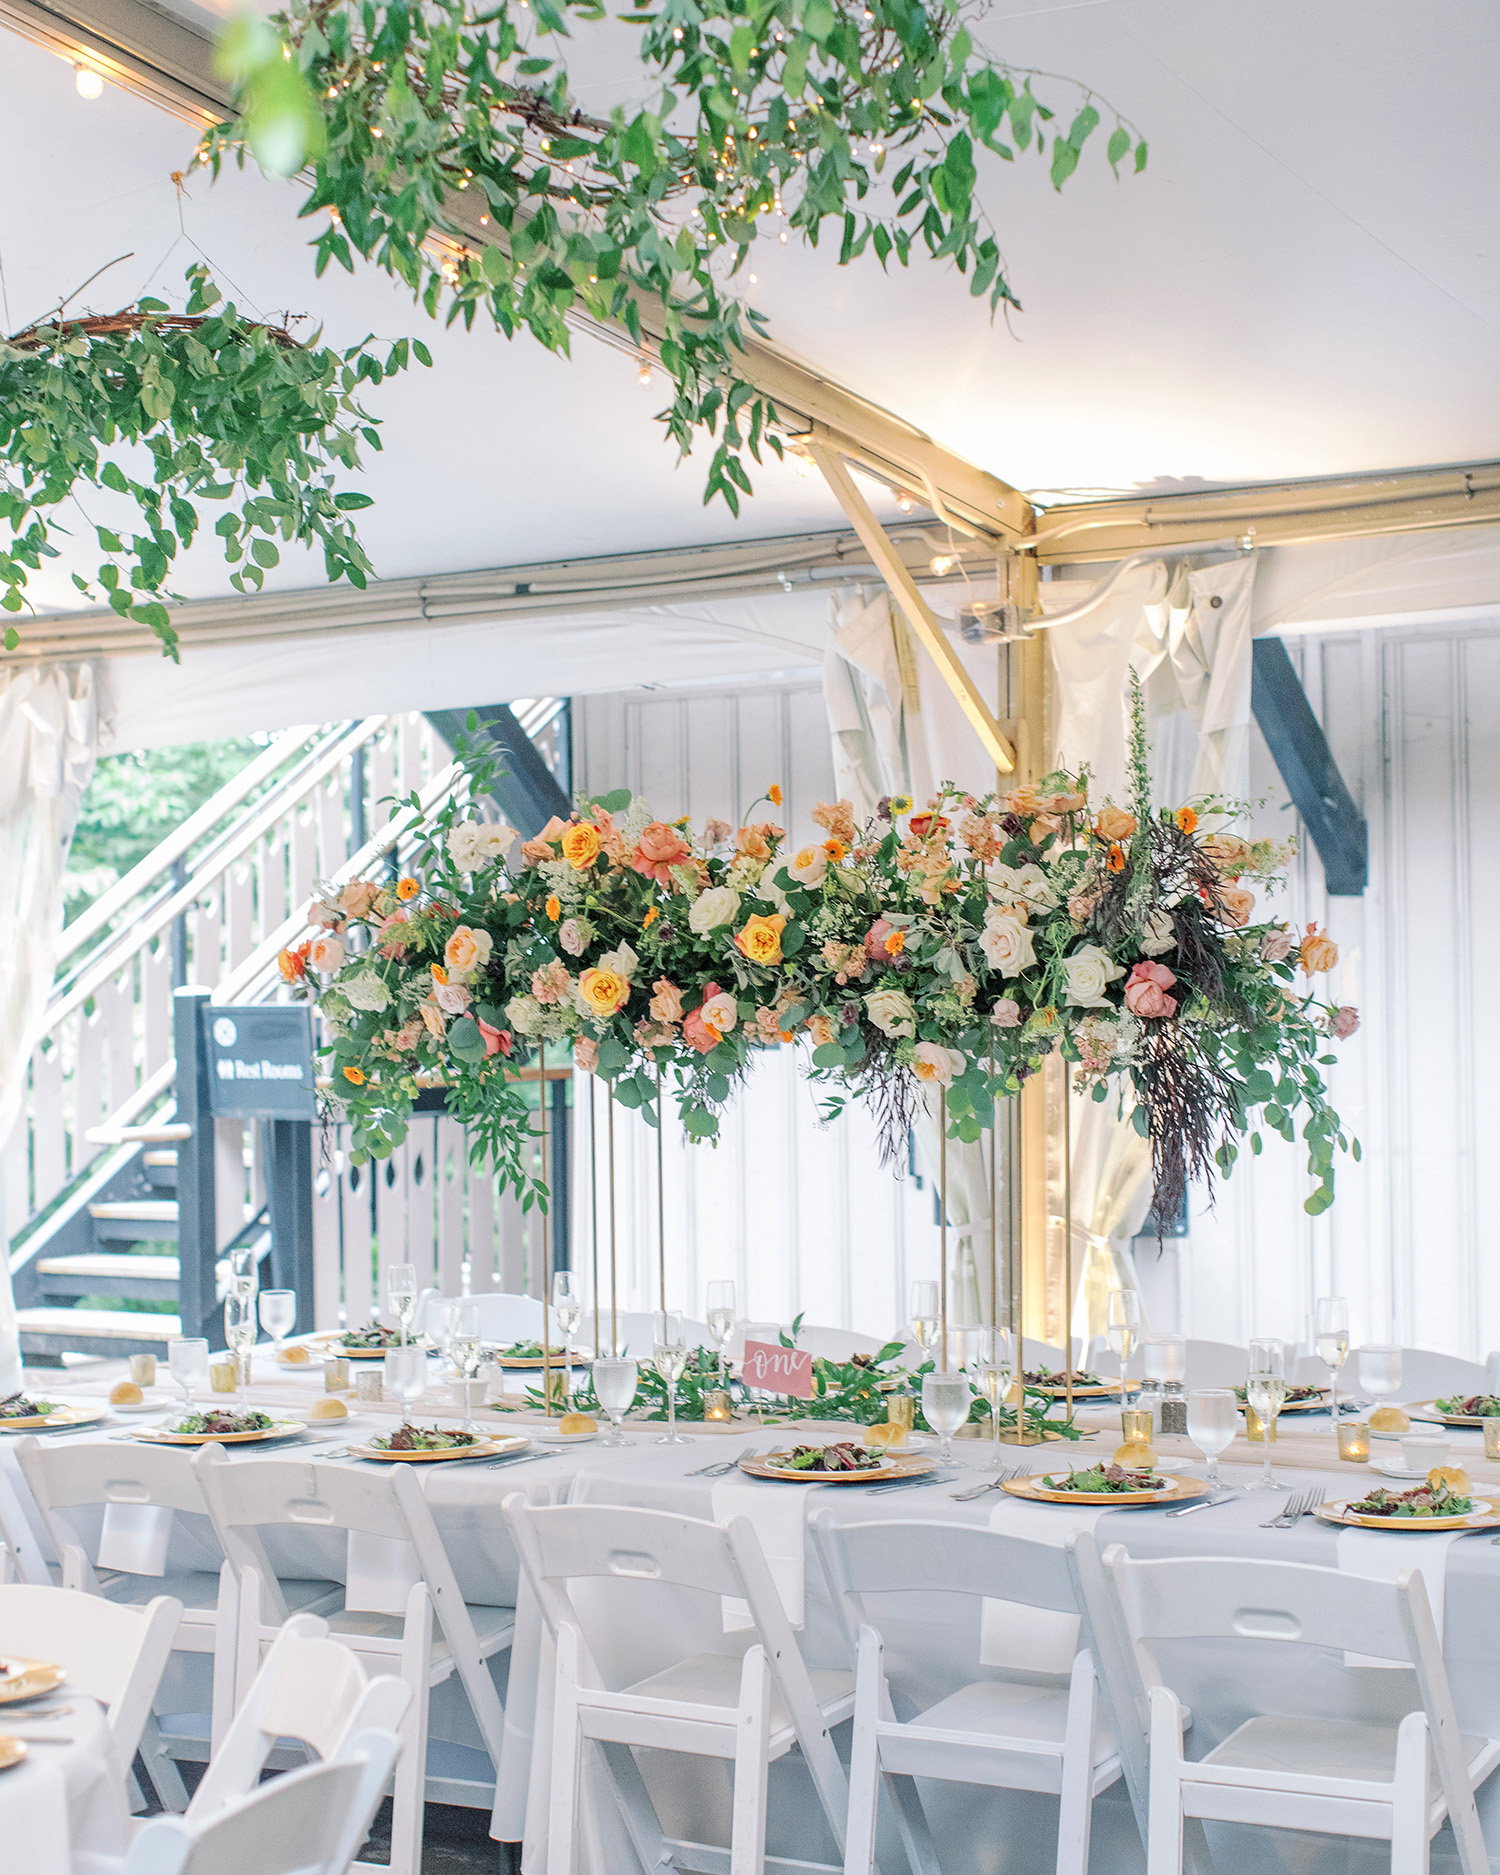 noel mike wedding reception table